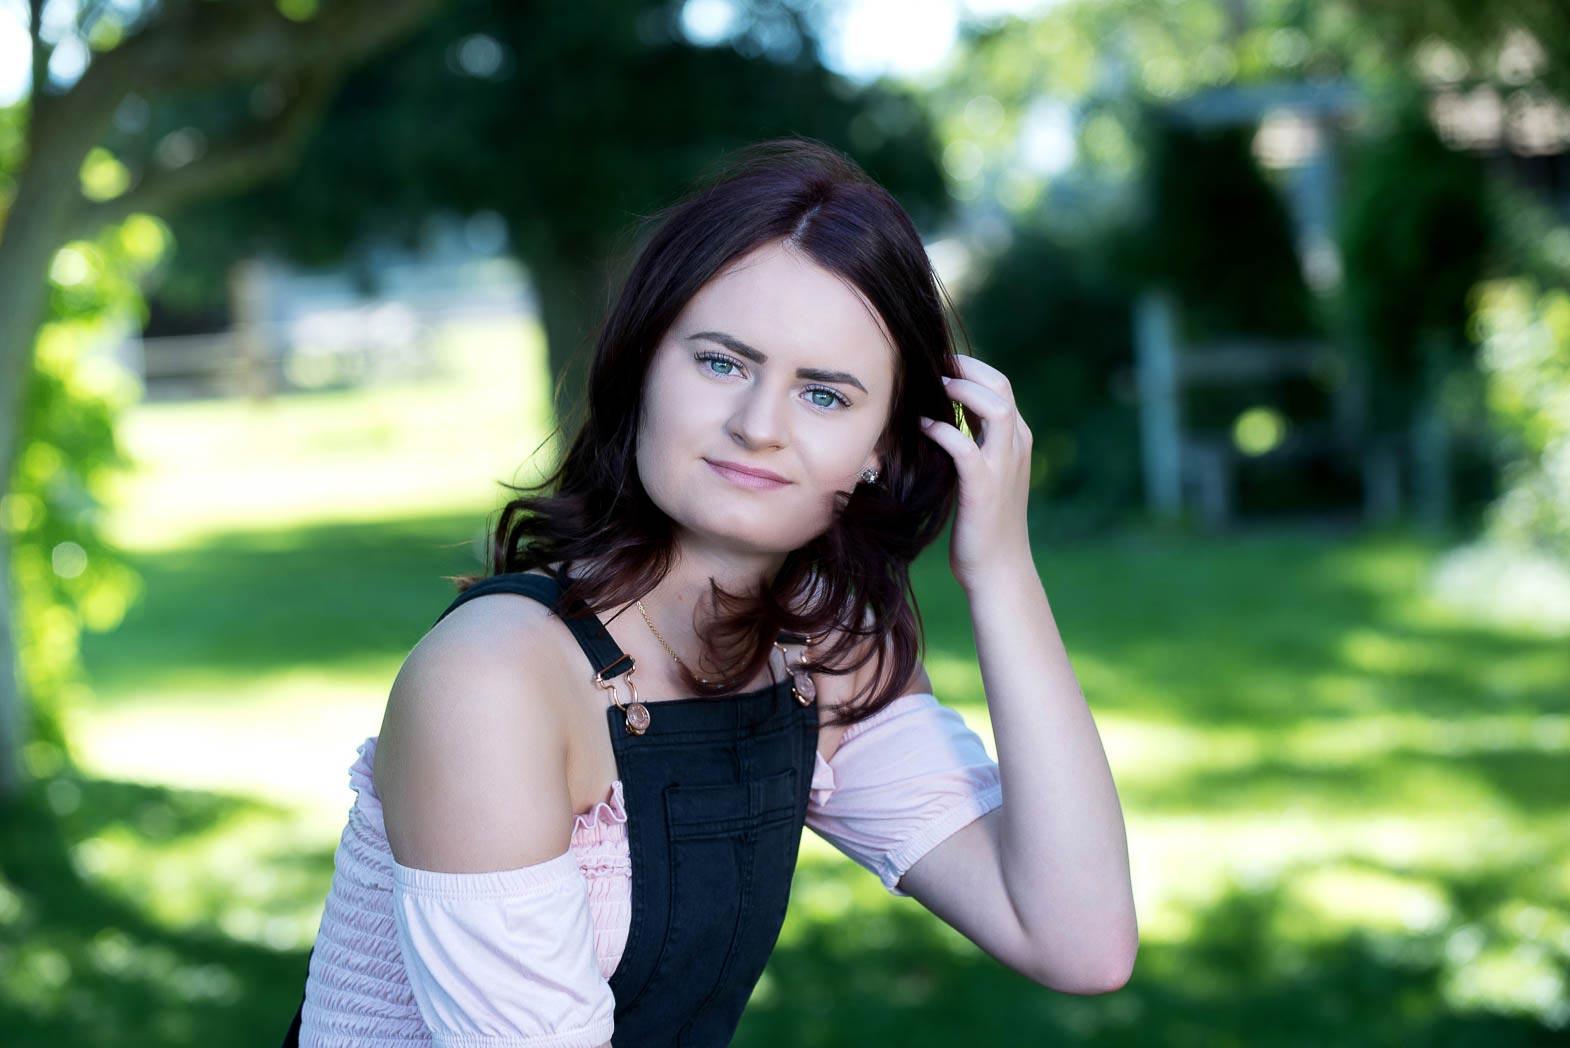 girl in park holding back her hair as she smile in senior picture